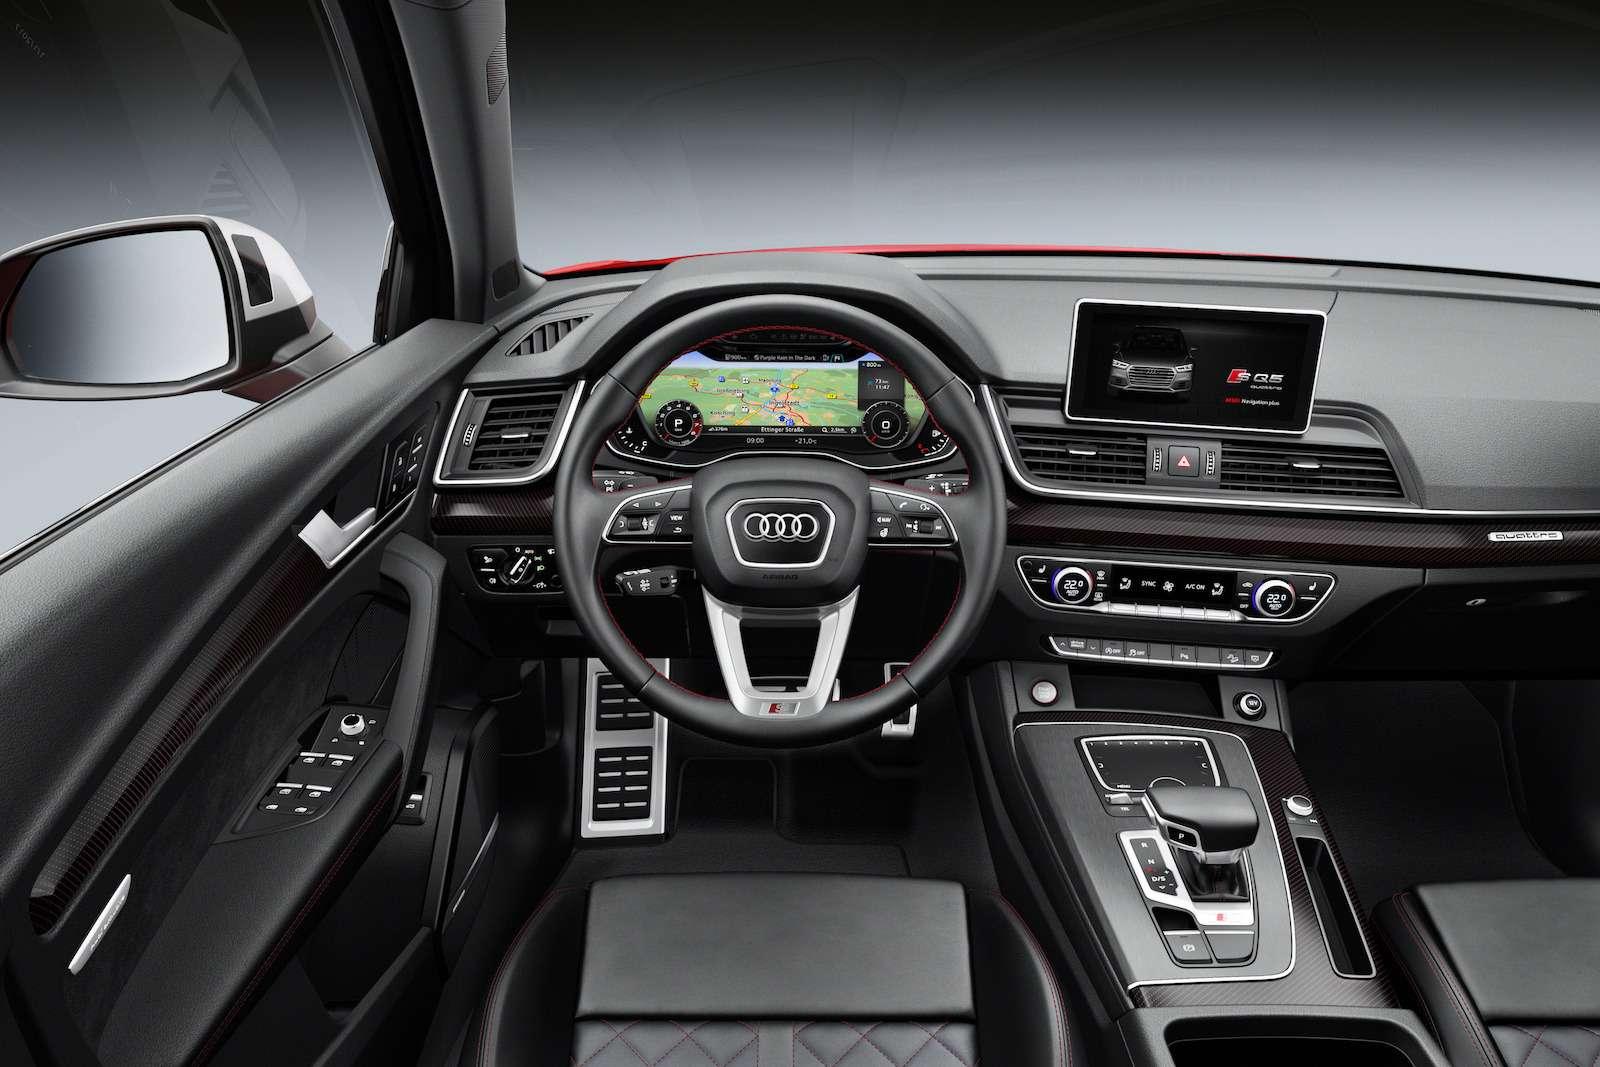 МАКС-2017: премьера Audi SQ5и RS5и гонки ссамолетами— фото 777804